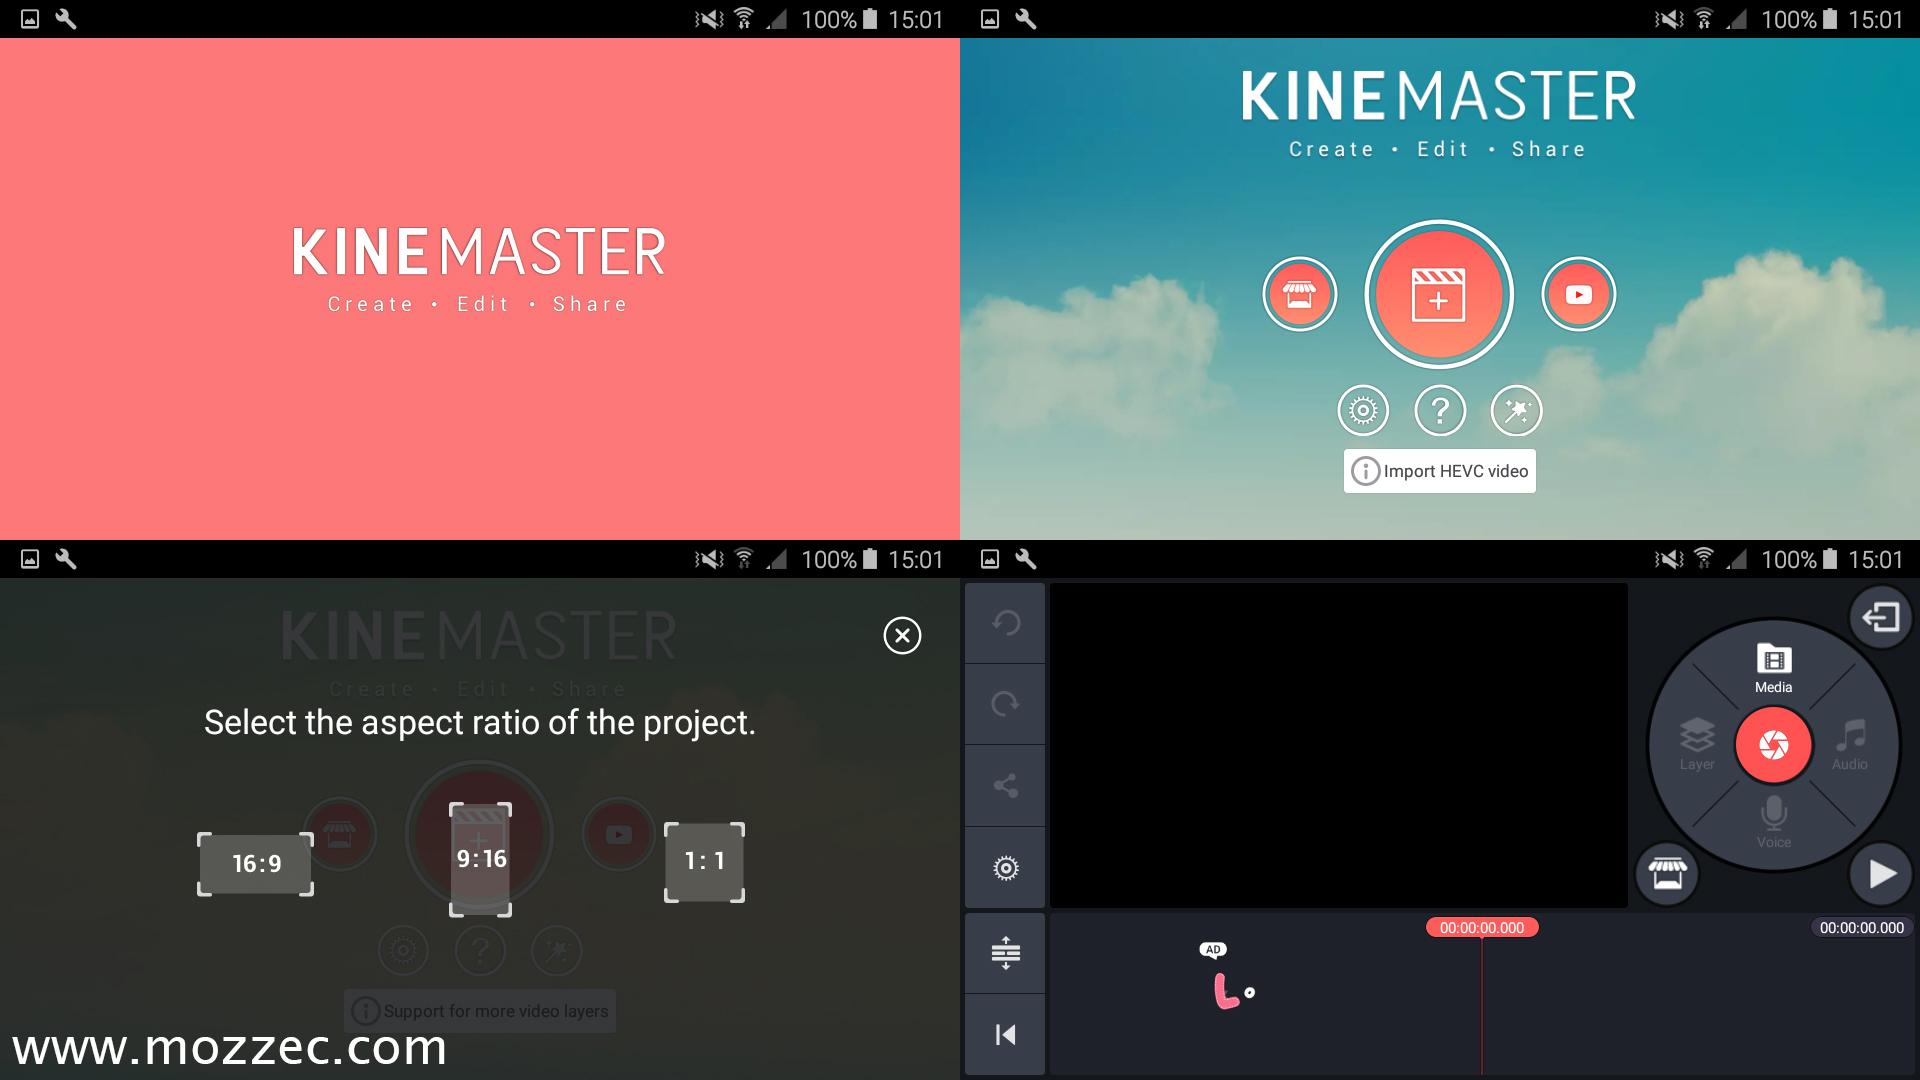 kinemaster apk download